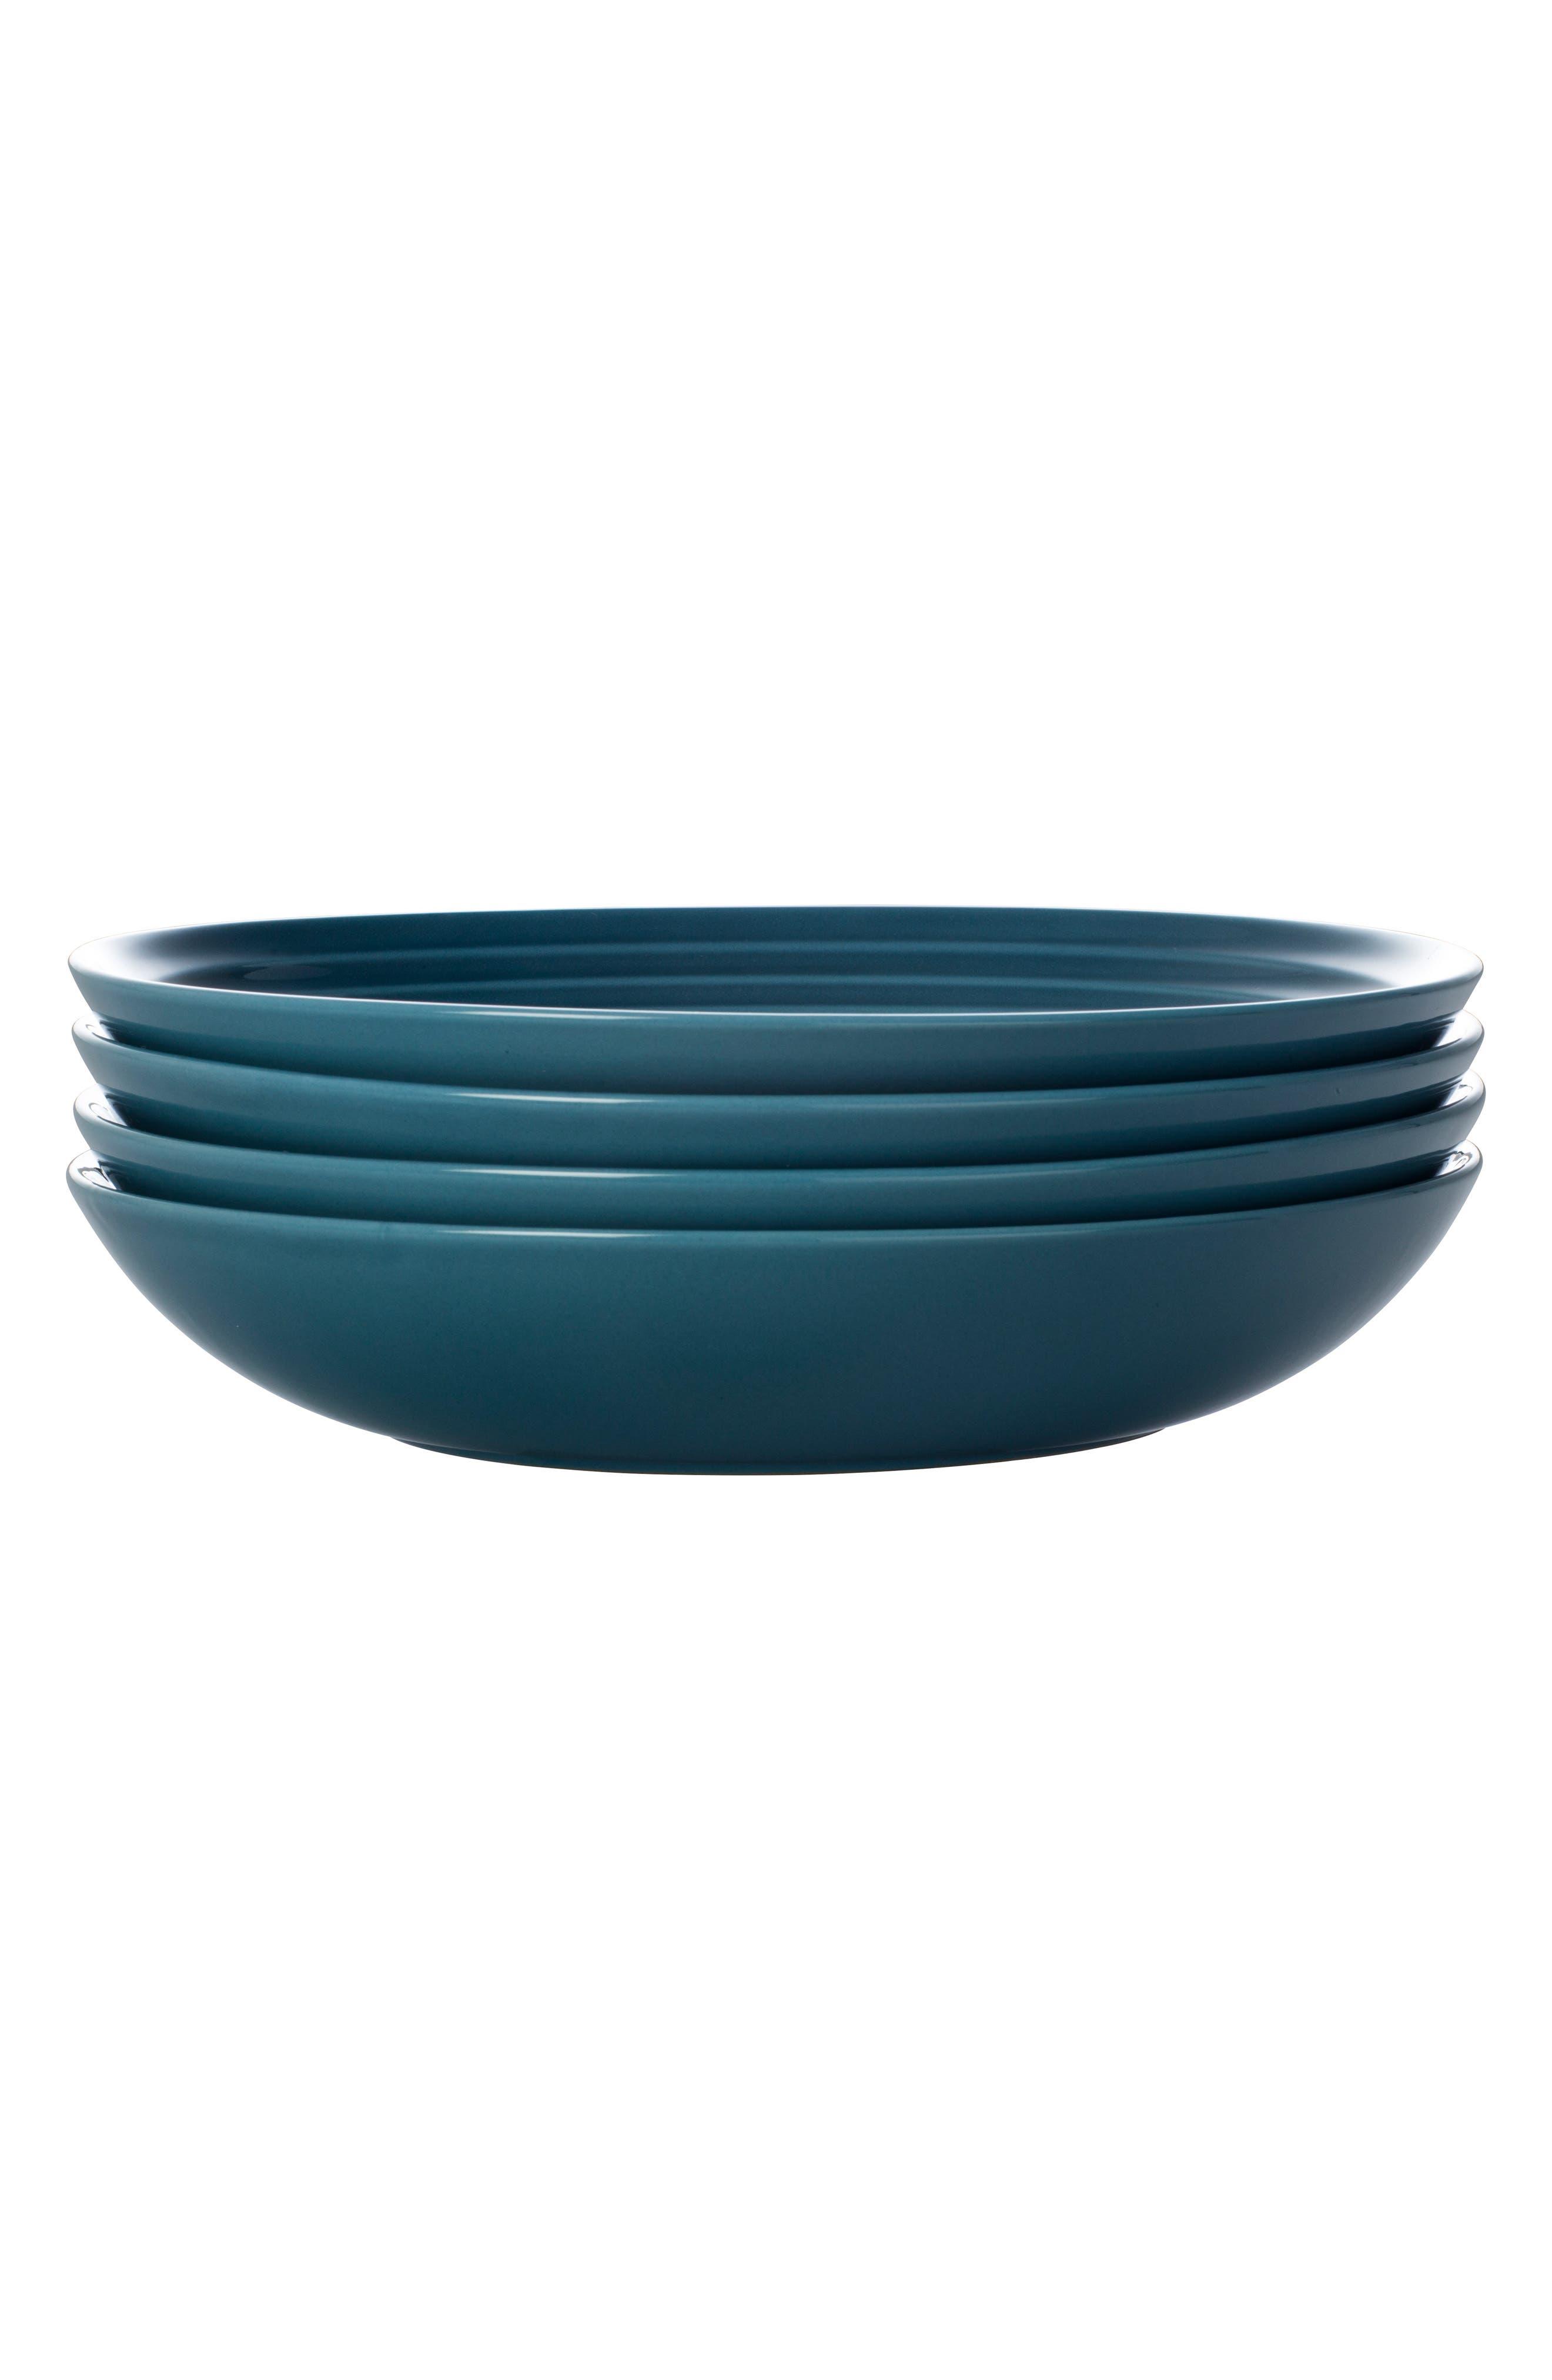 Le Creuset Set Of 4 9 34Inch Pasta Bowls Size One Size  Blue